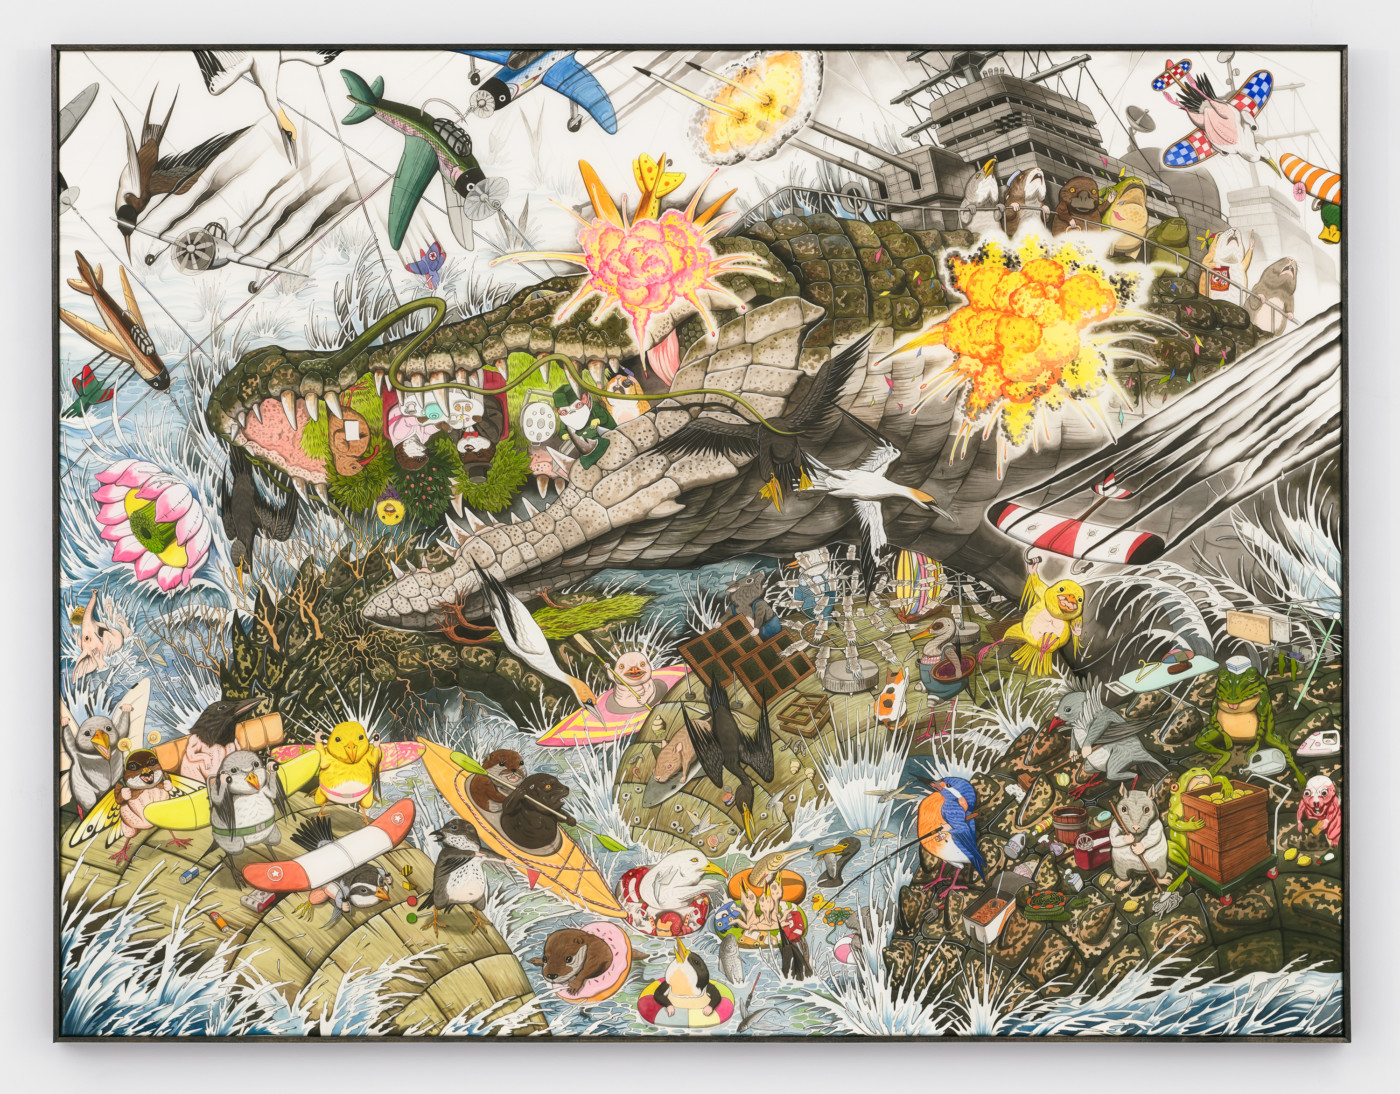 HUN KYU KIM  Symbiotic Wind , 2019 Pigment on silk 130 x 100 x 2.5 cm / 51.2 x 39.4 x 1 in  - High Art Gallery Paris